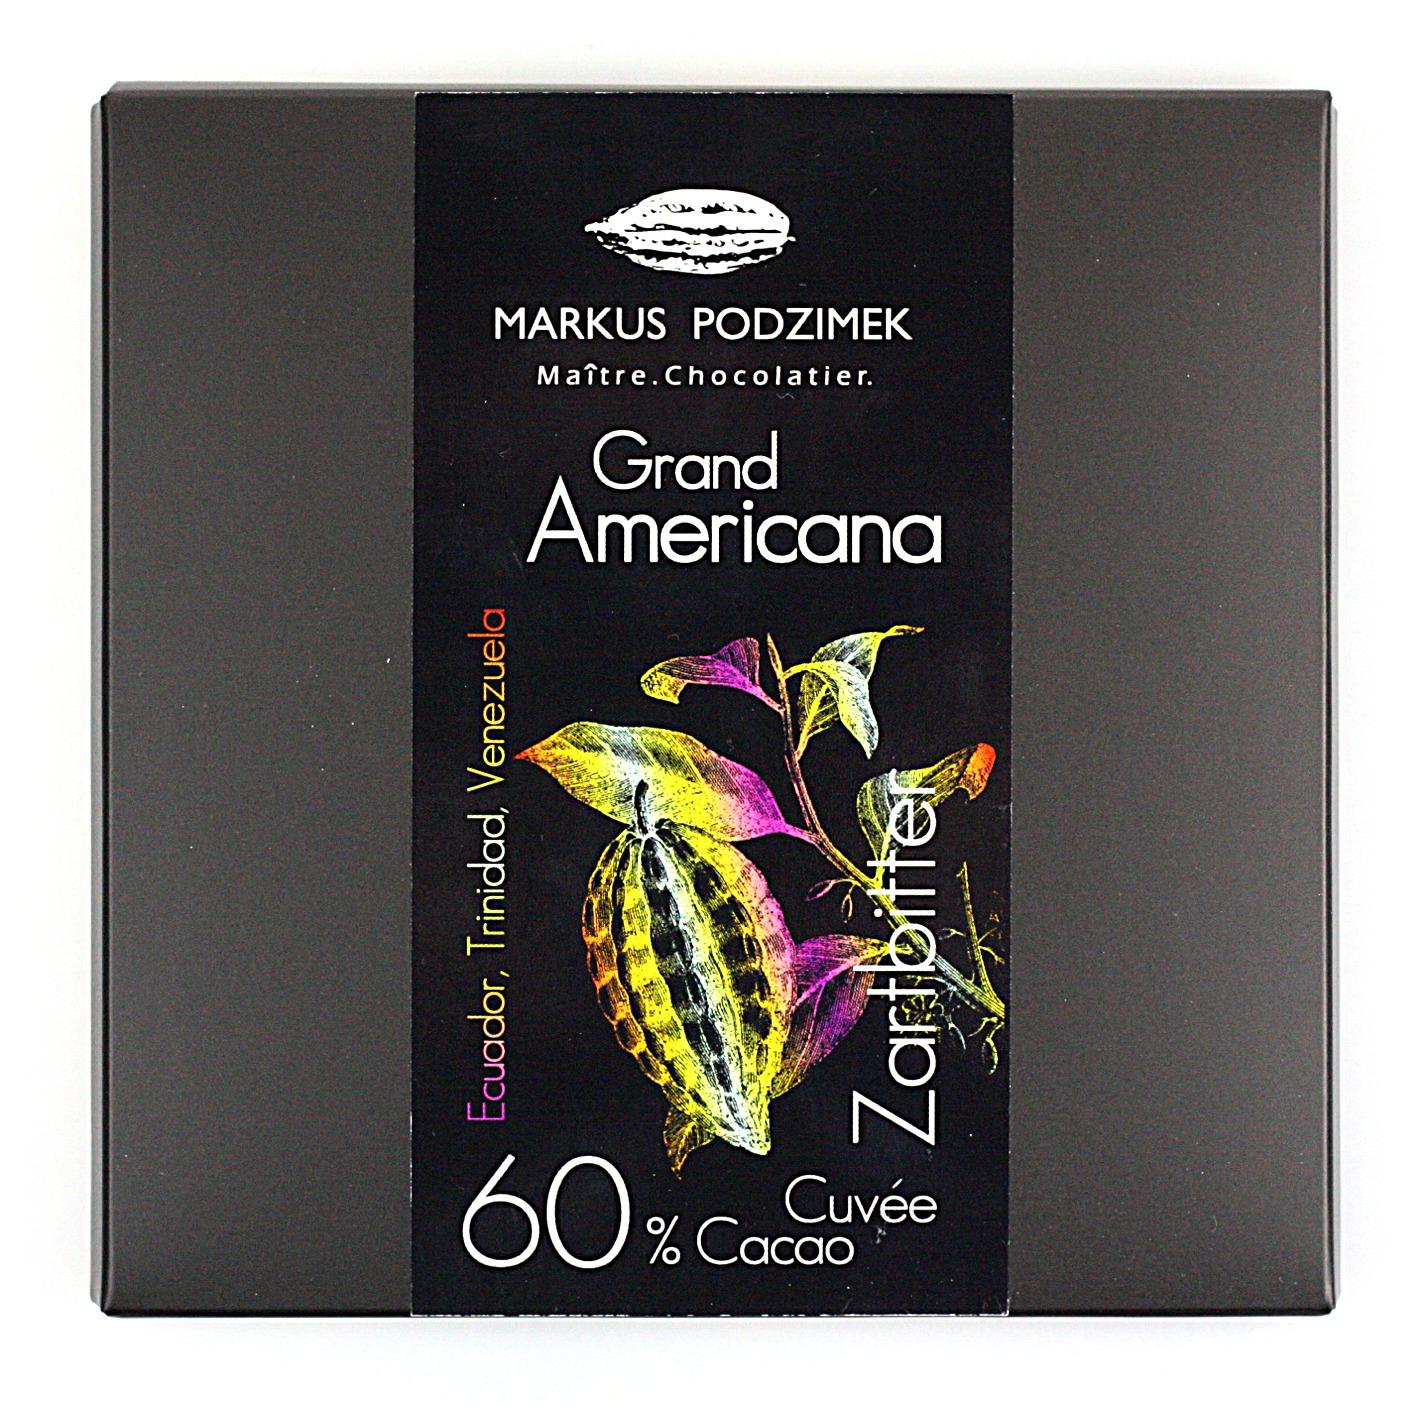 GrandAmericanaEdel-Bitterschokolademit60cao-1